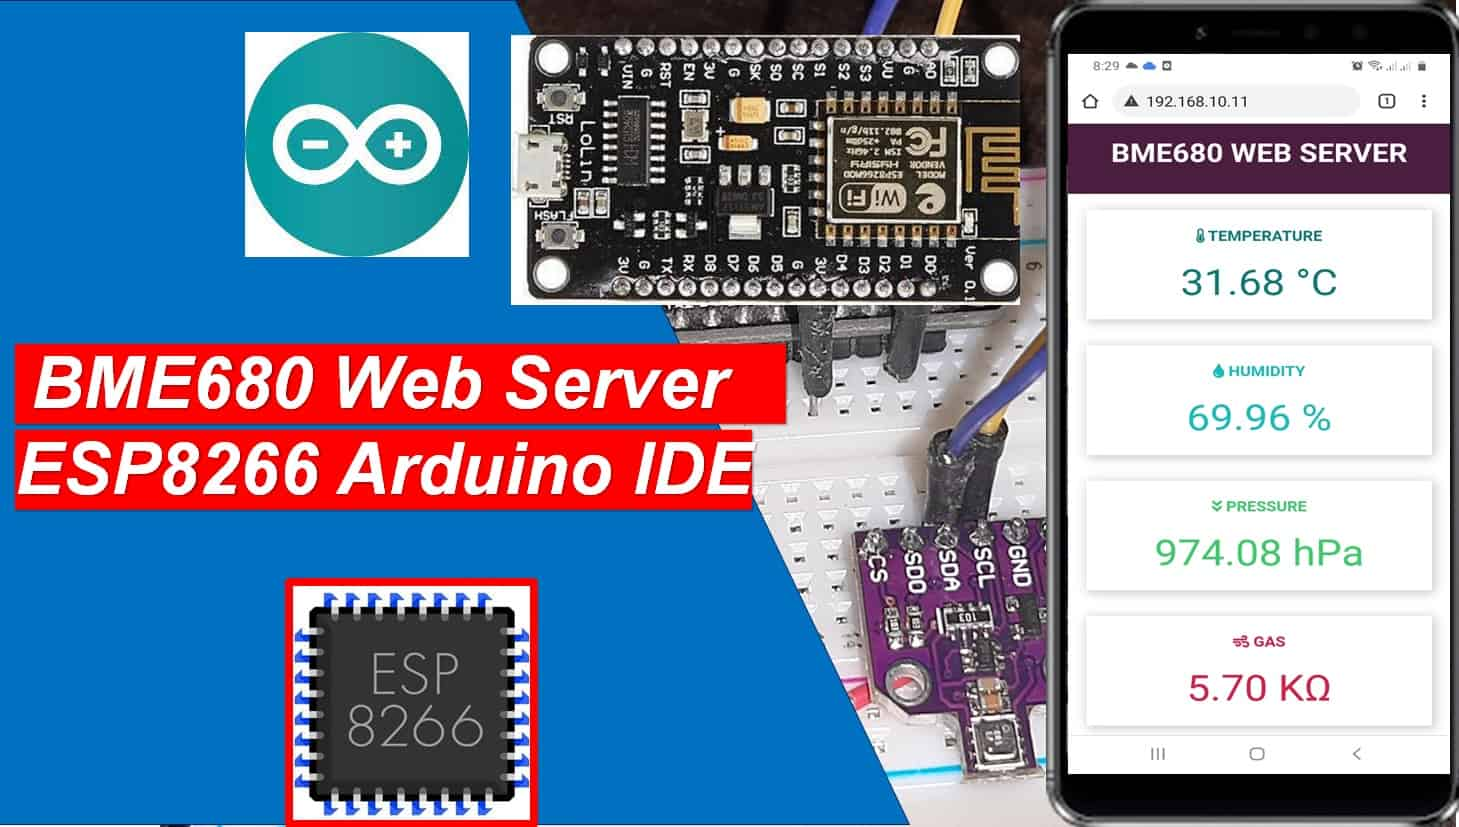 BME680 web server using ESP8266 Arduino IDE temperature pressure humidity gas